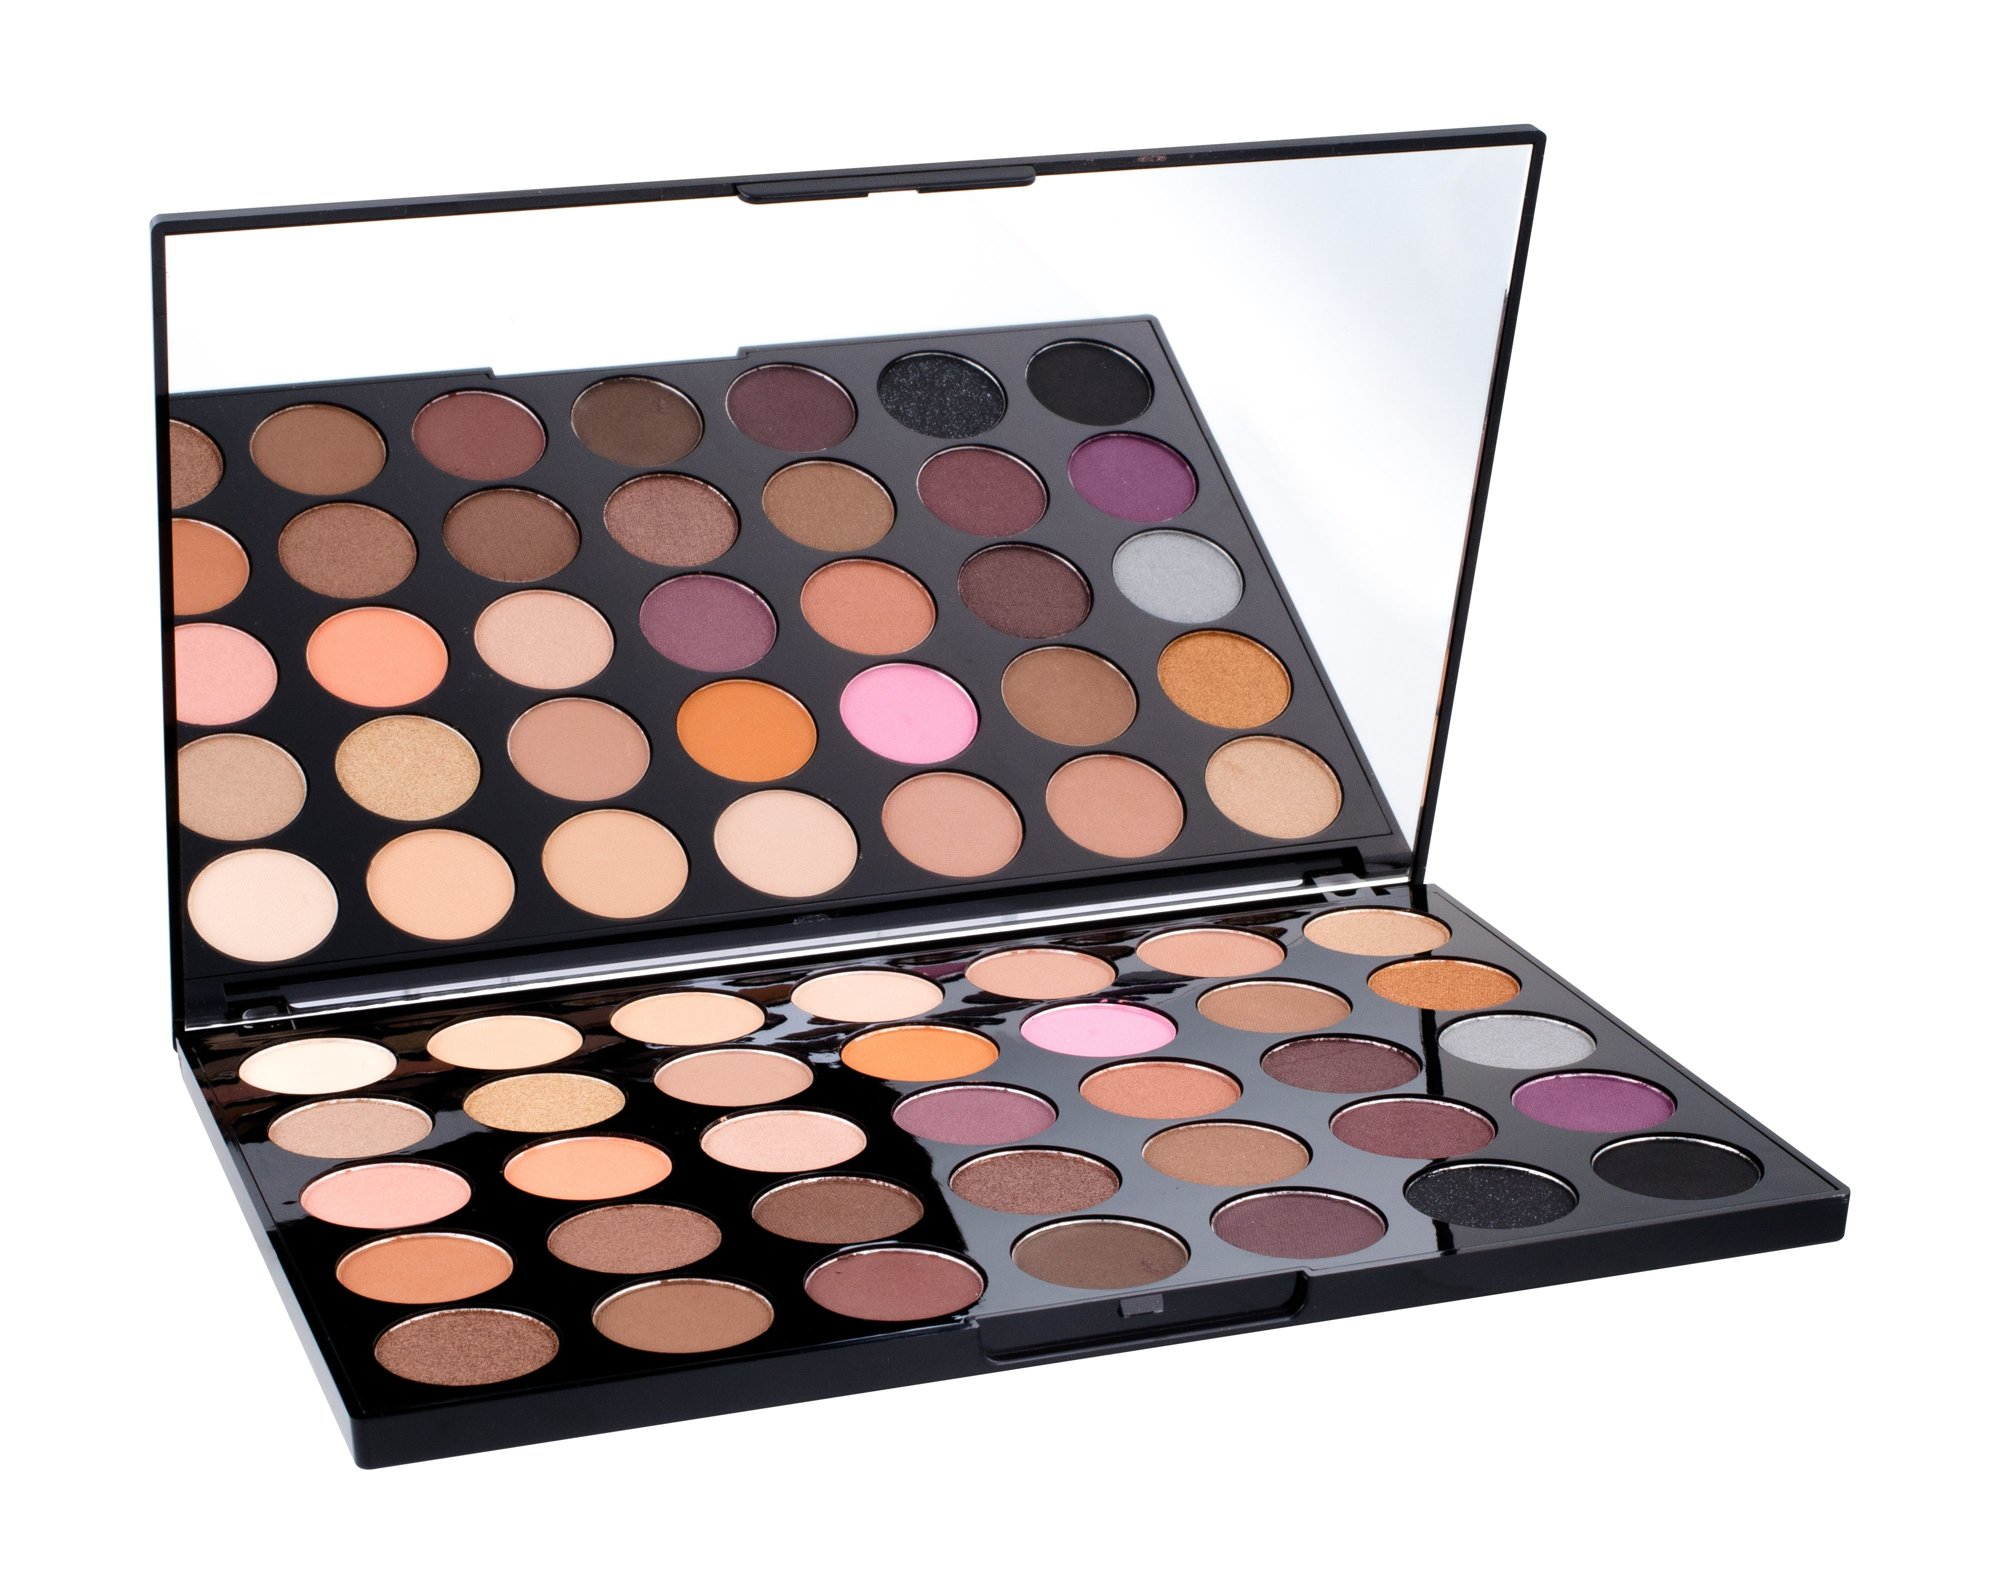 Makeup Revolution London Pro HD Cosmetic 29,995ml Neutrals Warm